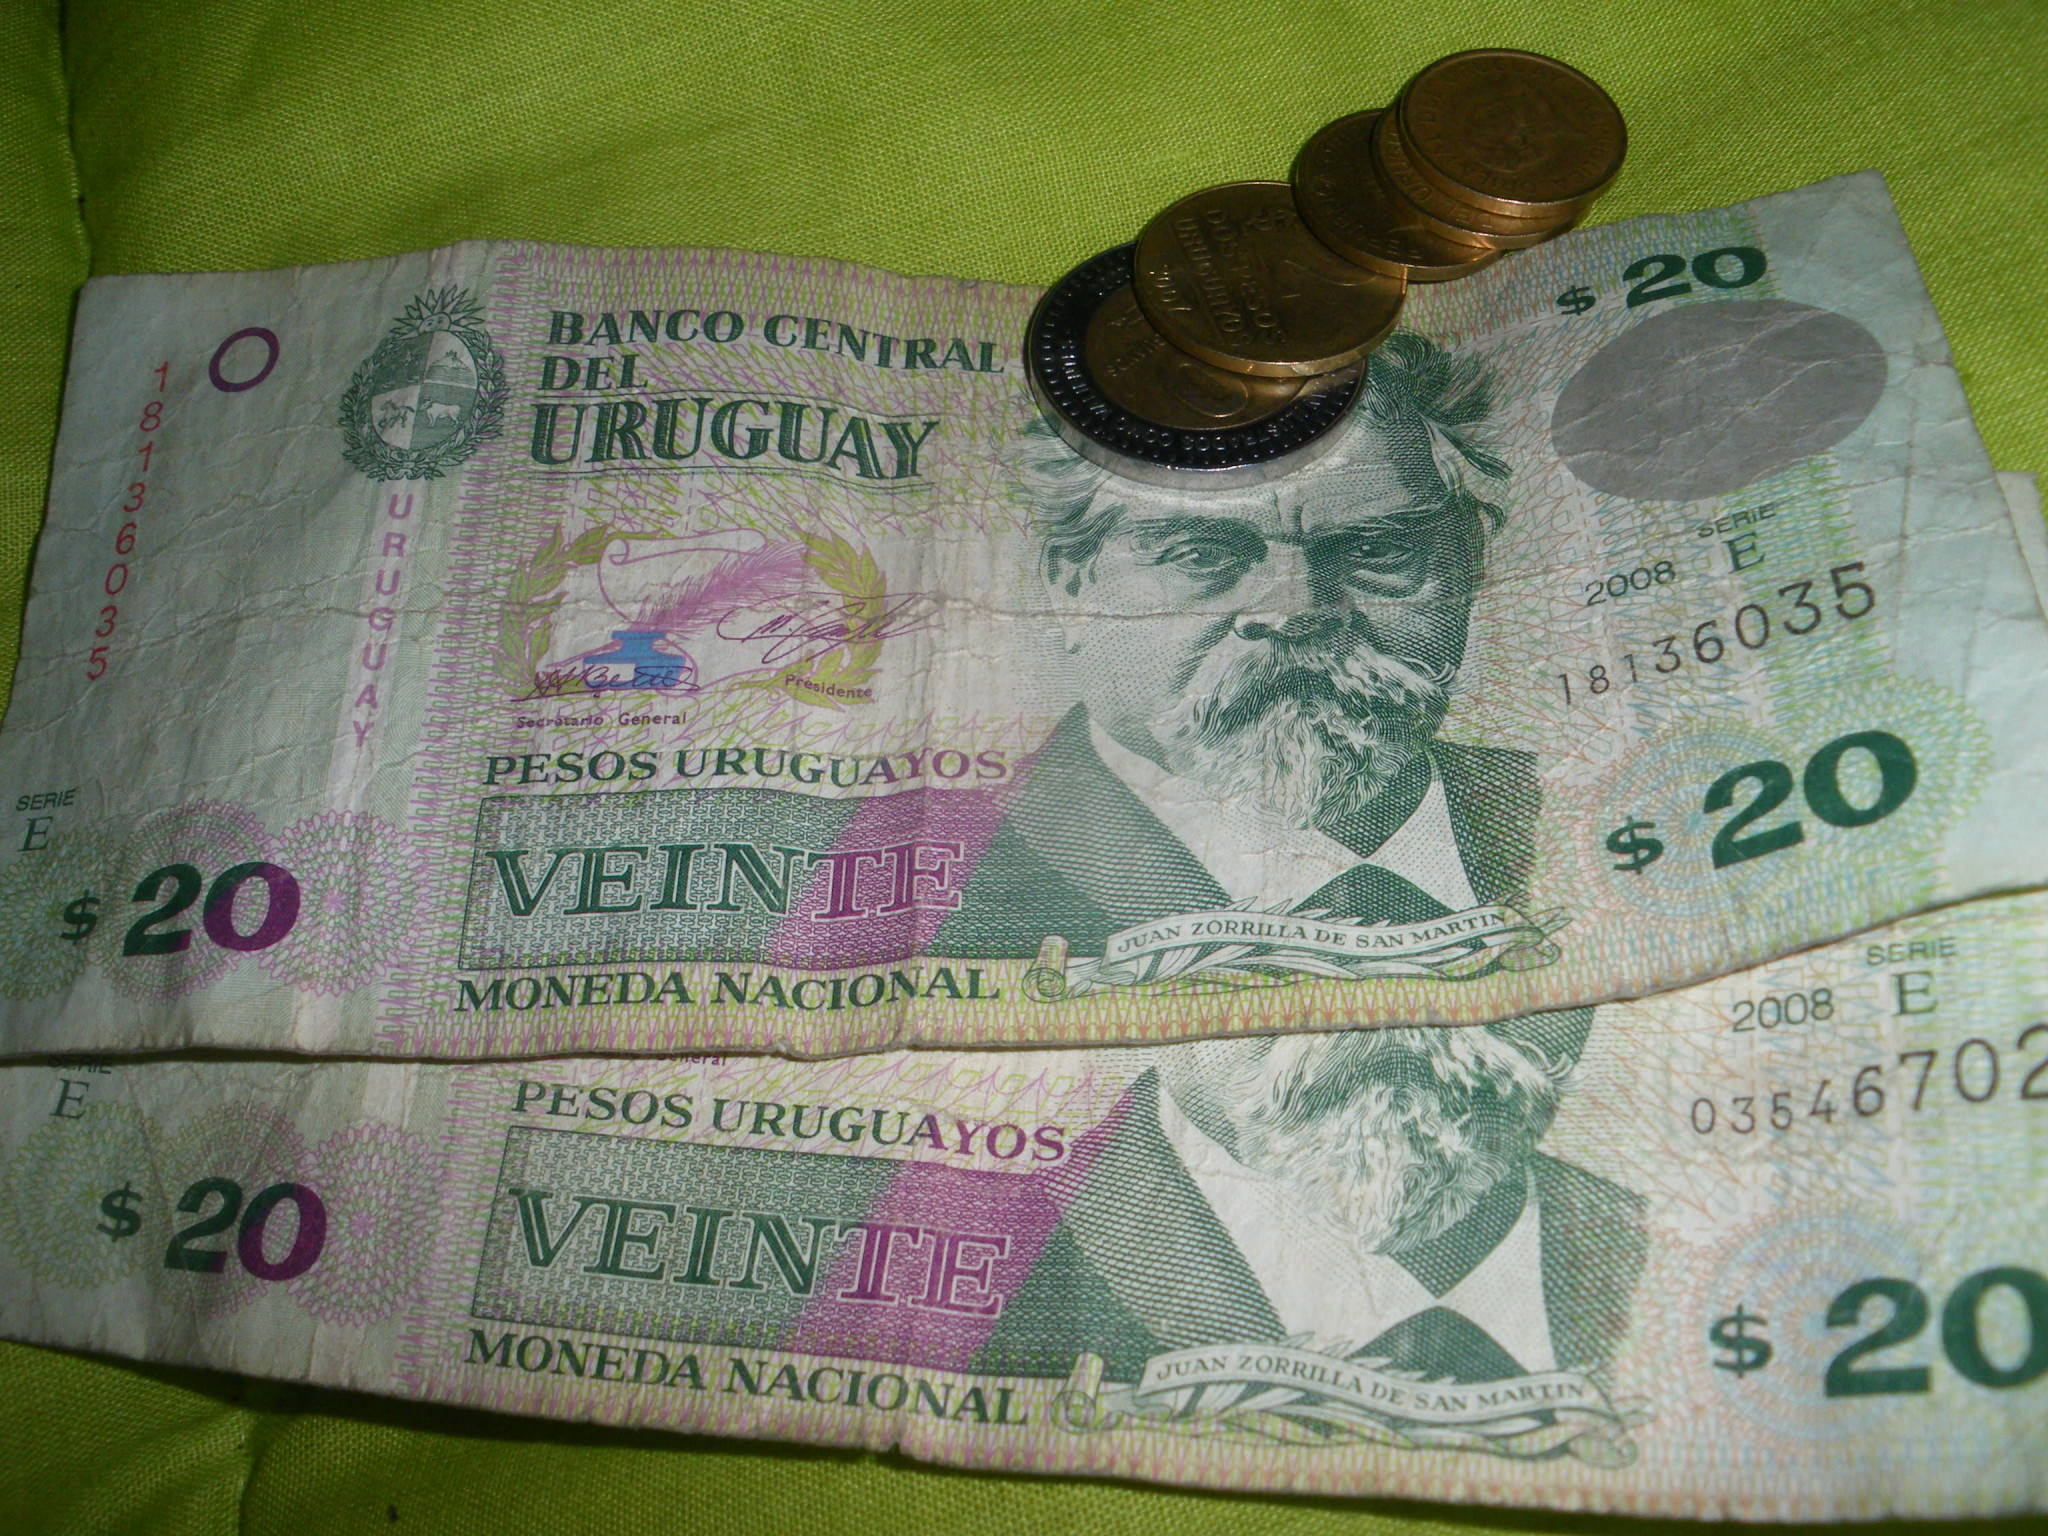 Uruguayann Pesos in Montevideo